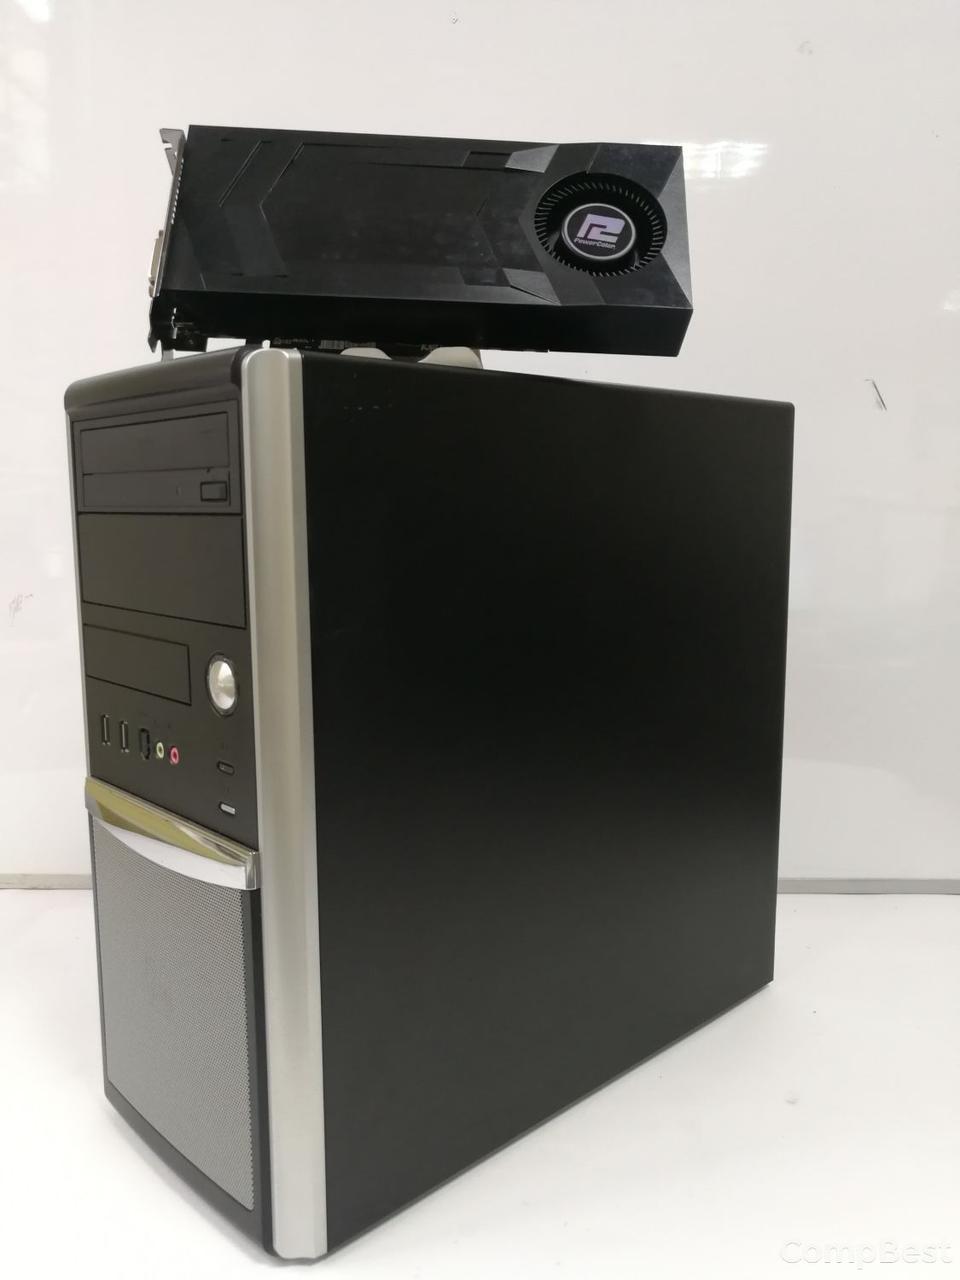 EuroCom Tower / Intel® Core™ i5-2400 (4 ядра по 3.10 - 3.40 GHz) / 12GB DDR3 / 500GB SSHD / Radeon RX470 4GB DDR5 256bit / HDMI,DVI,DP / БП-600W